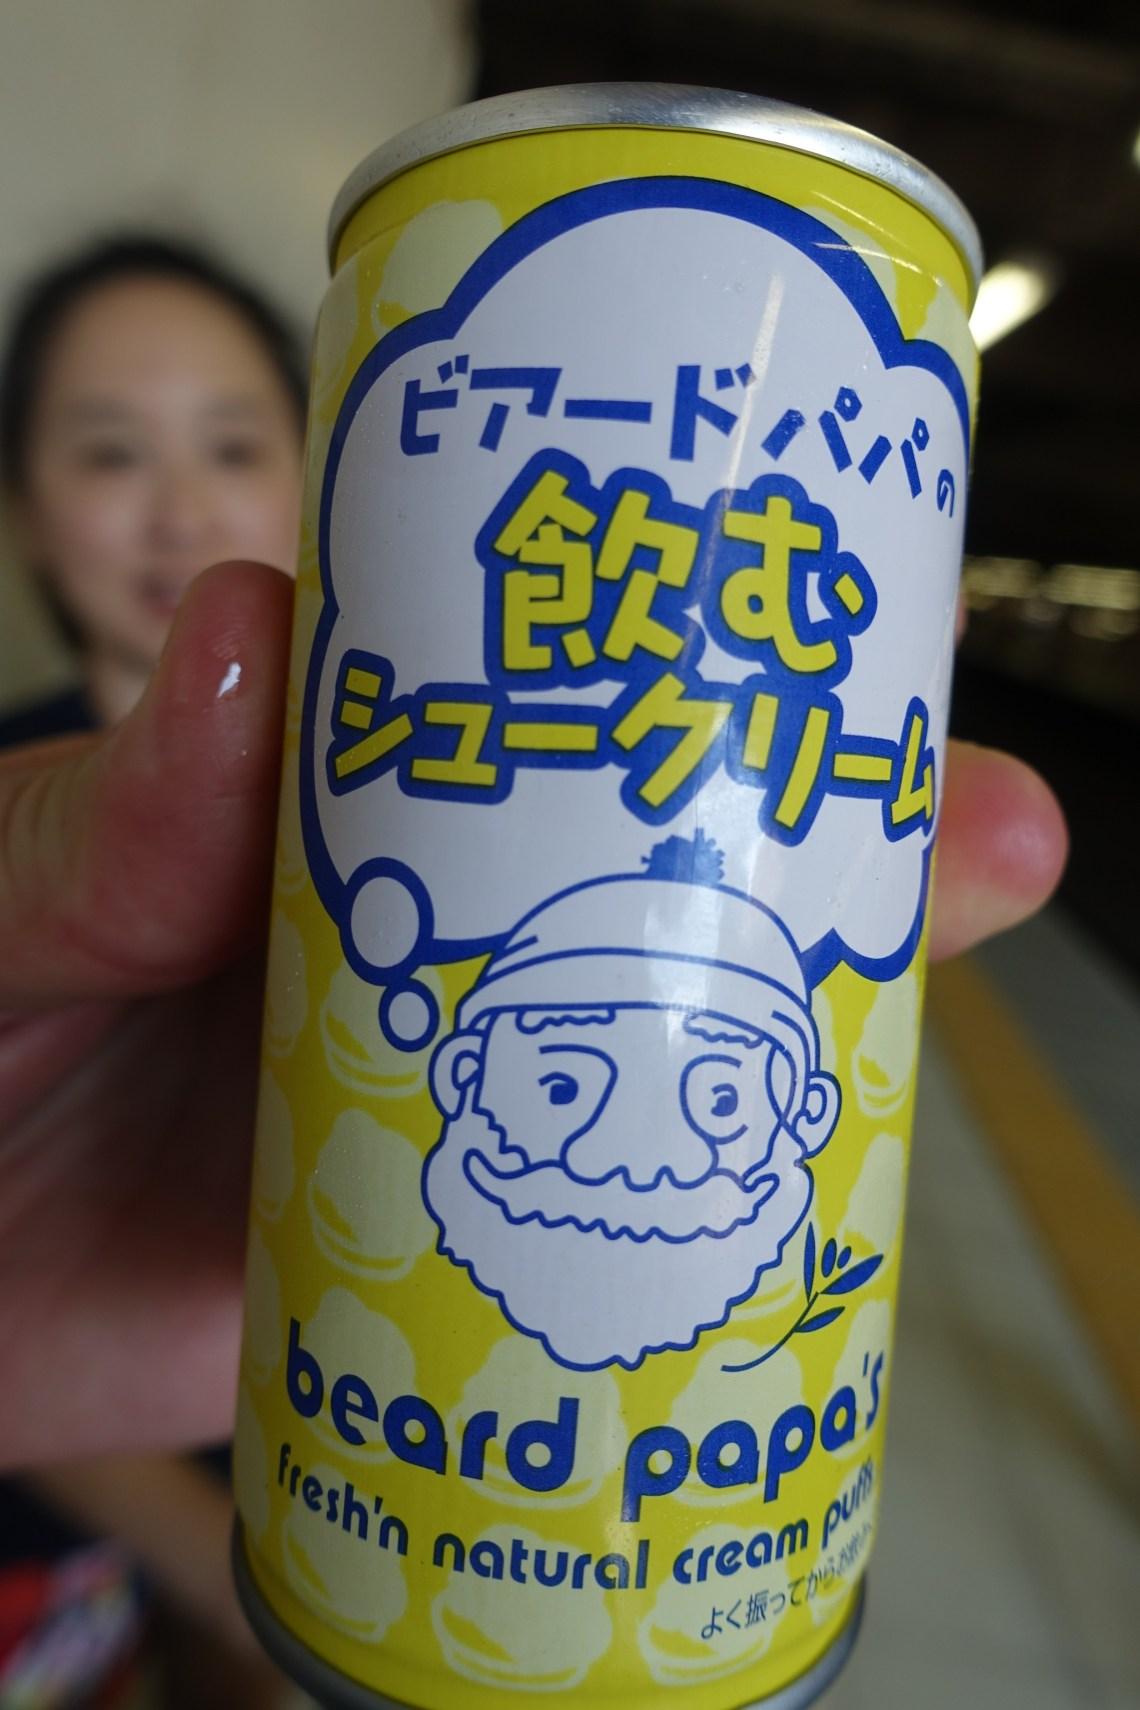 Beard Papa drink